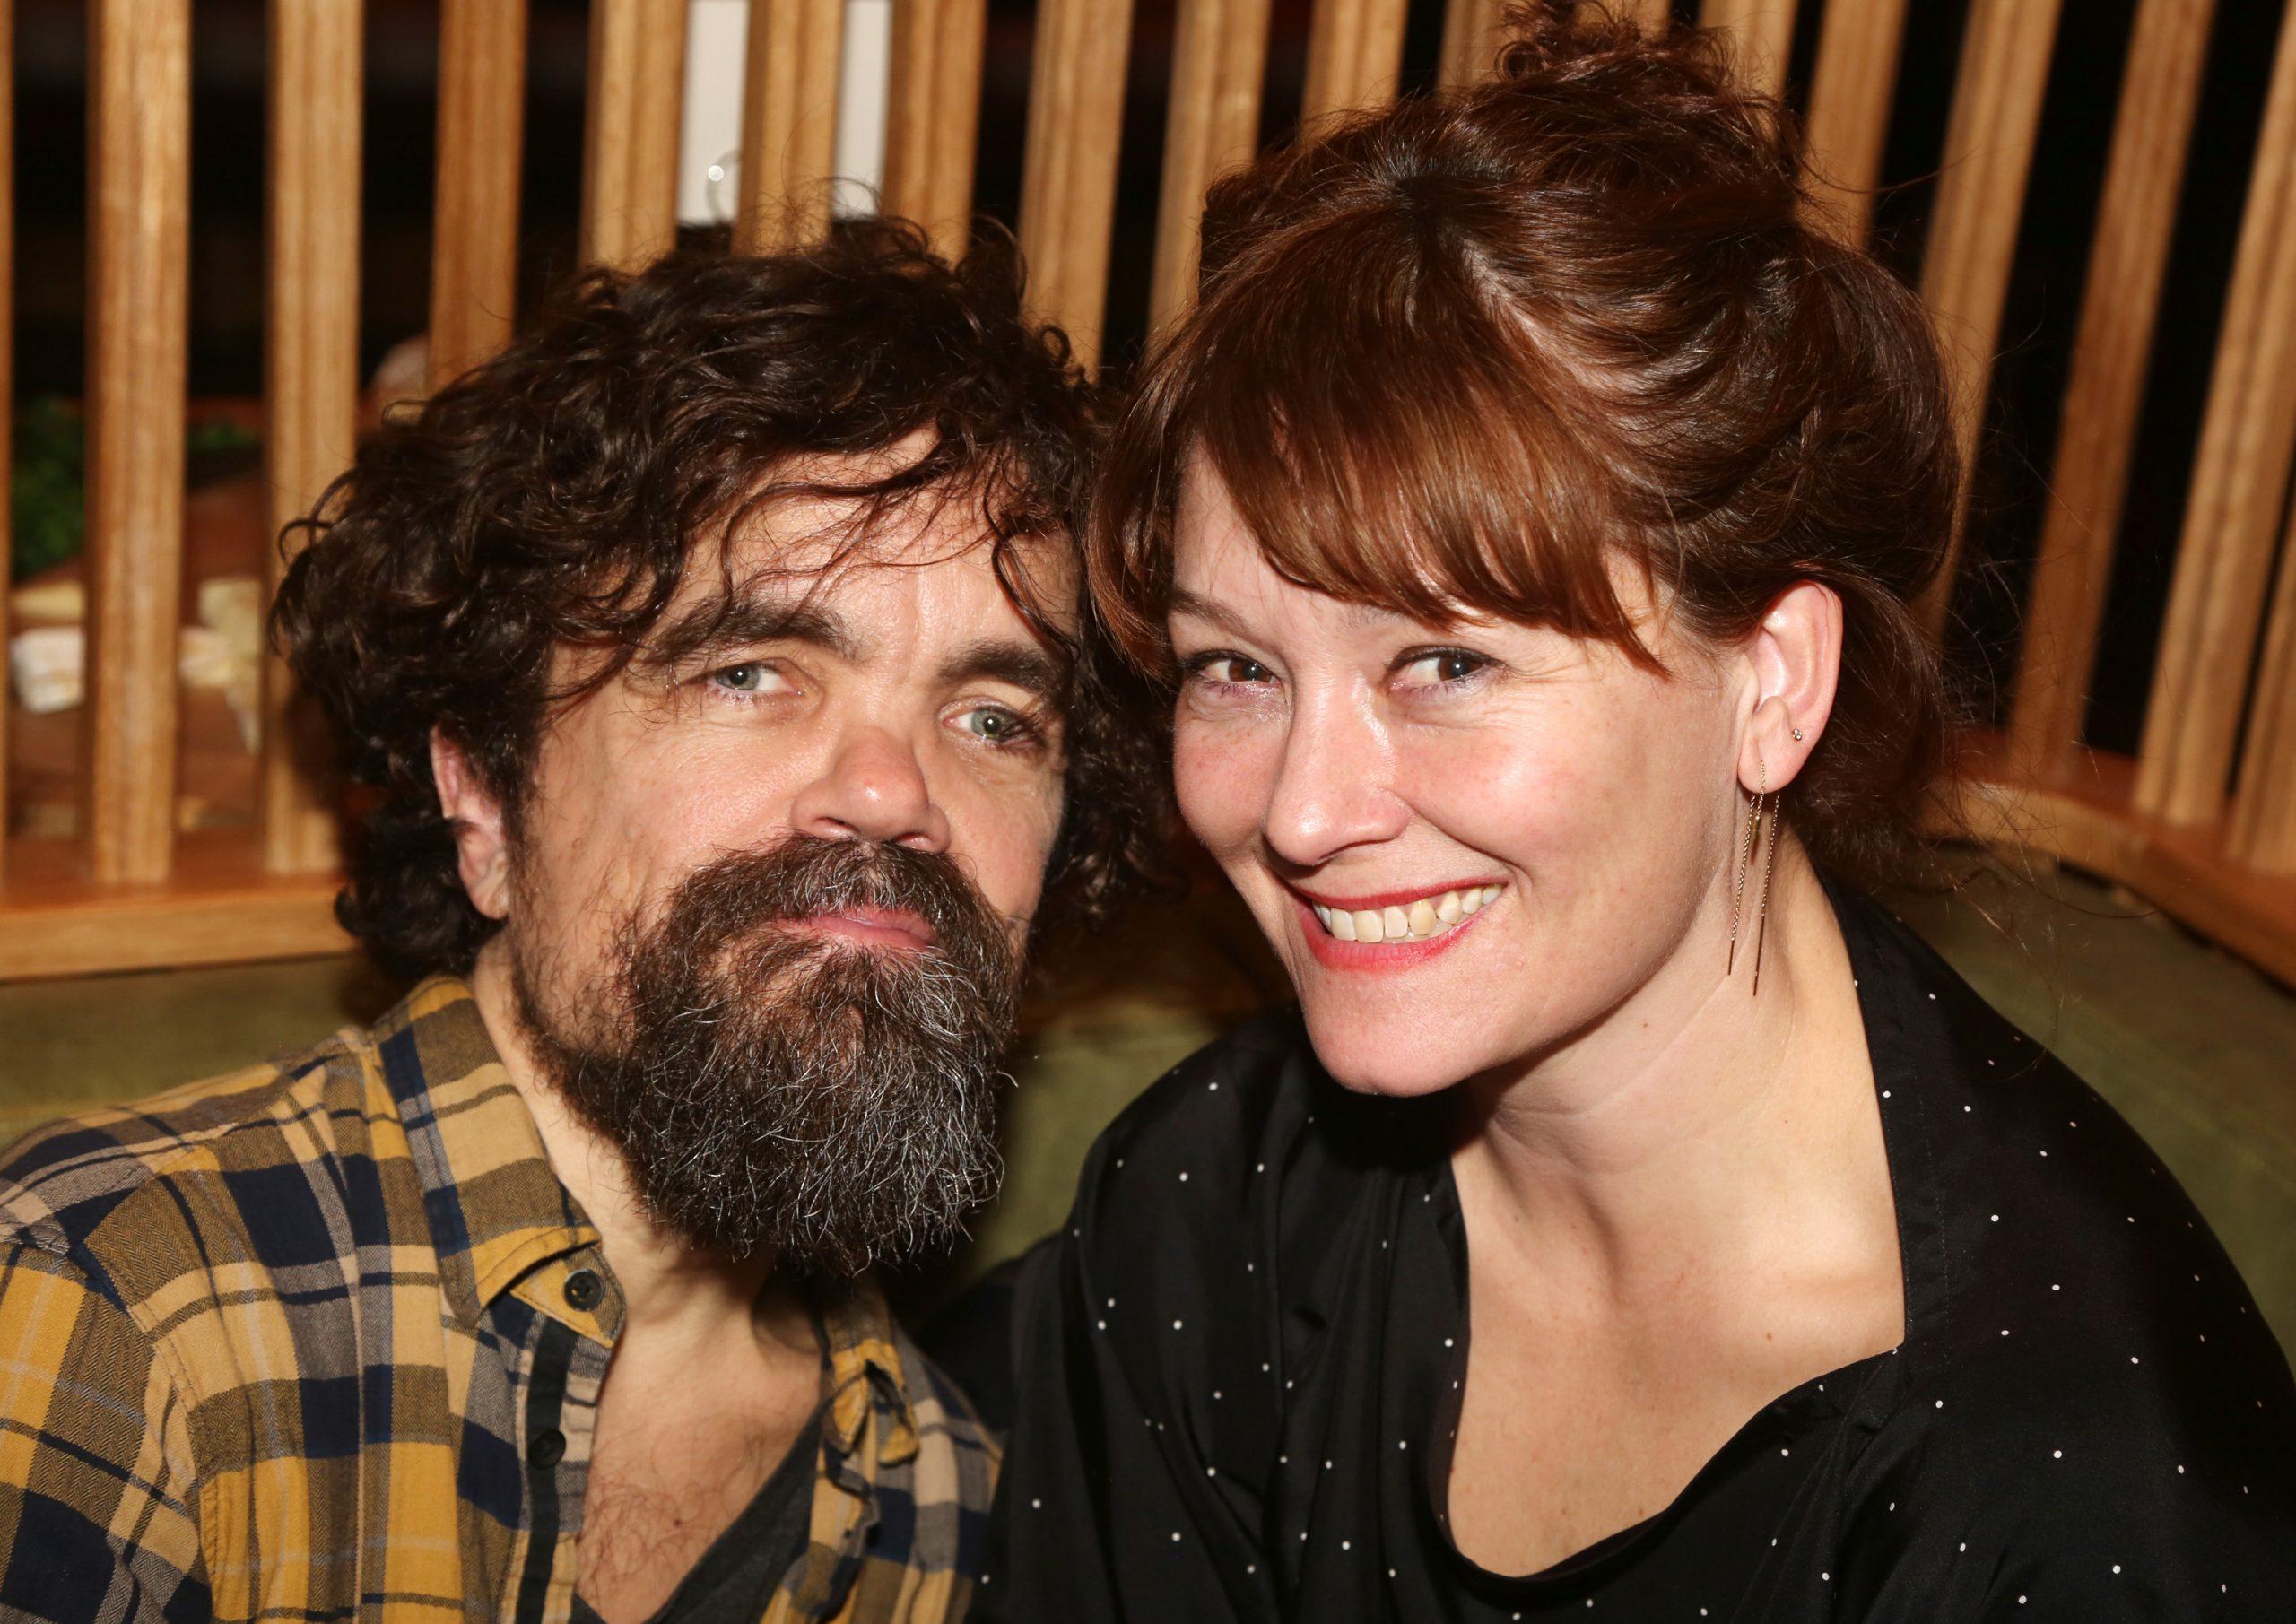 Peter Dinklage and Erica Schmidt